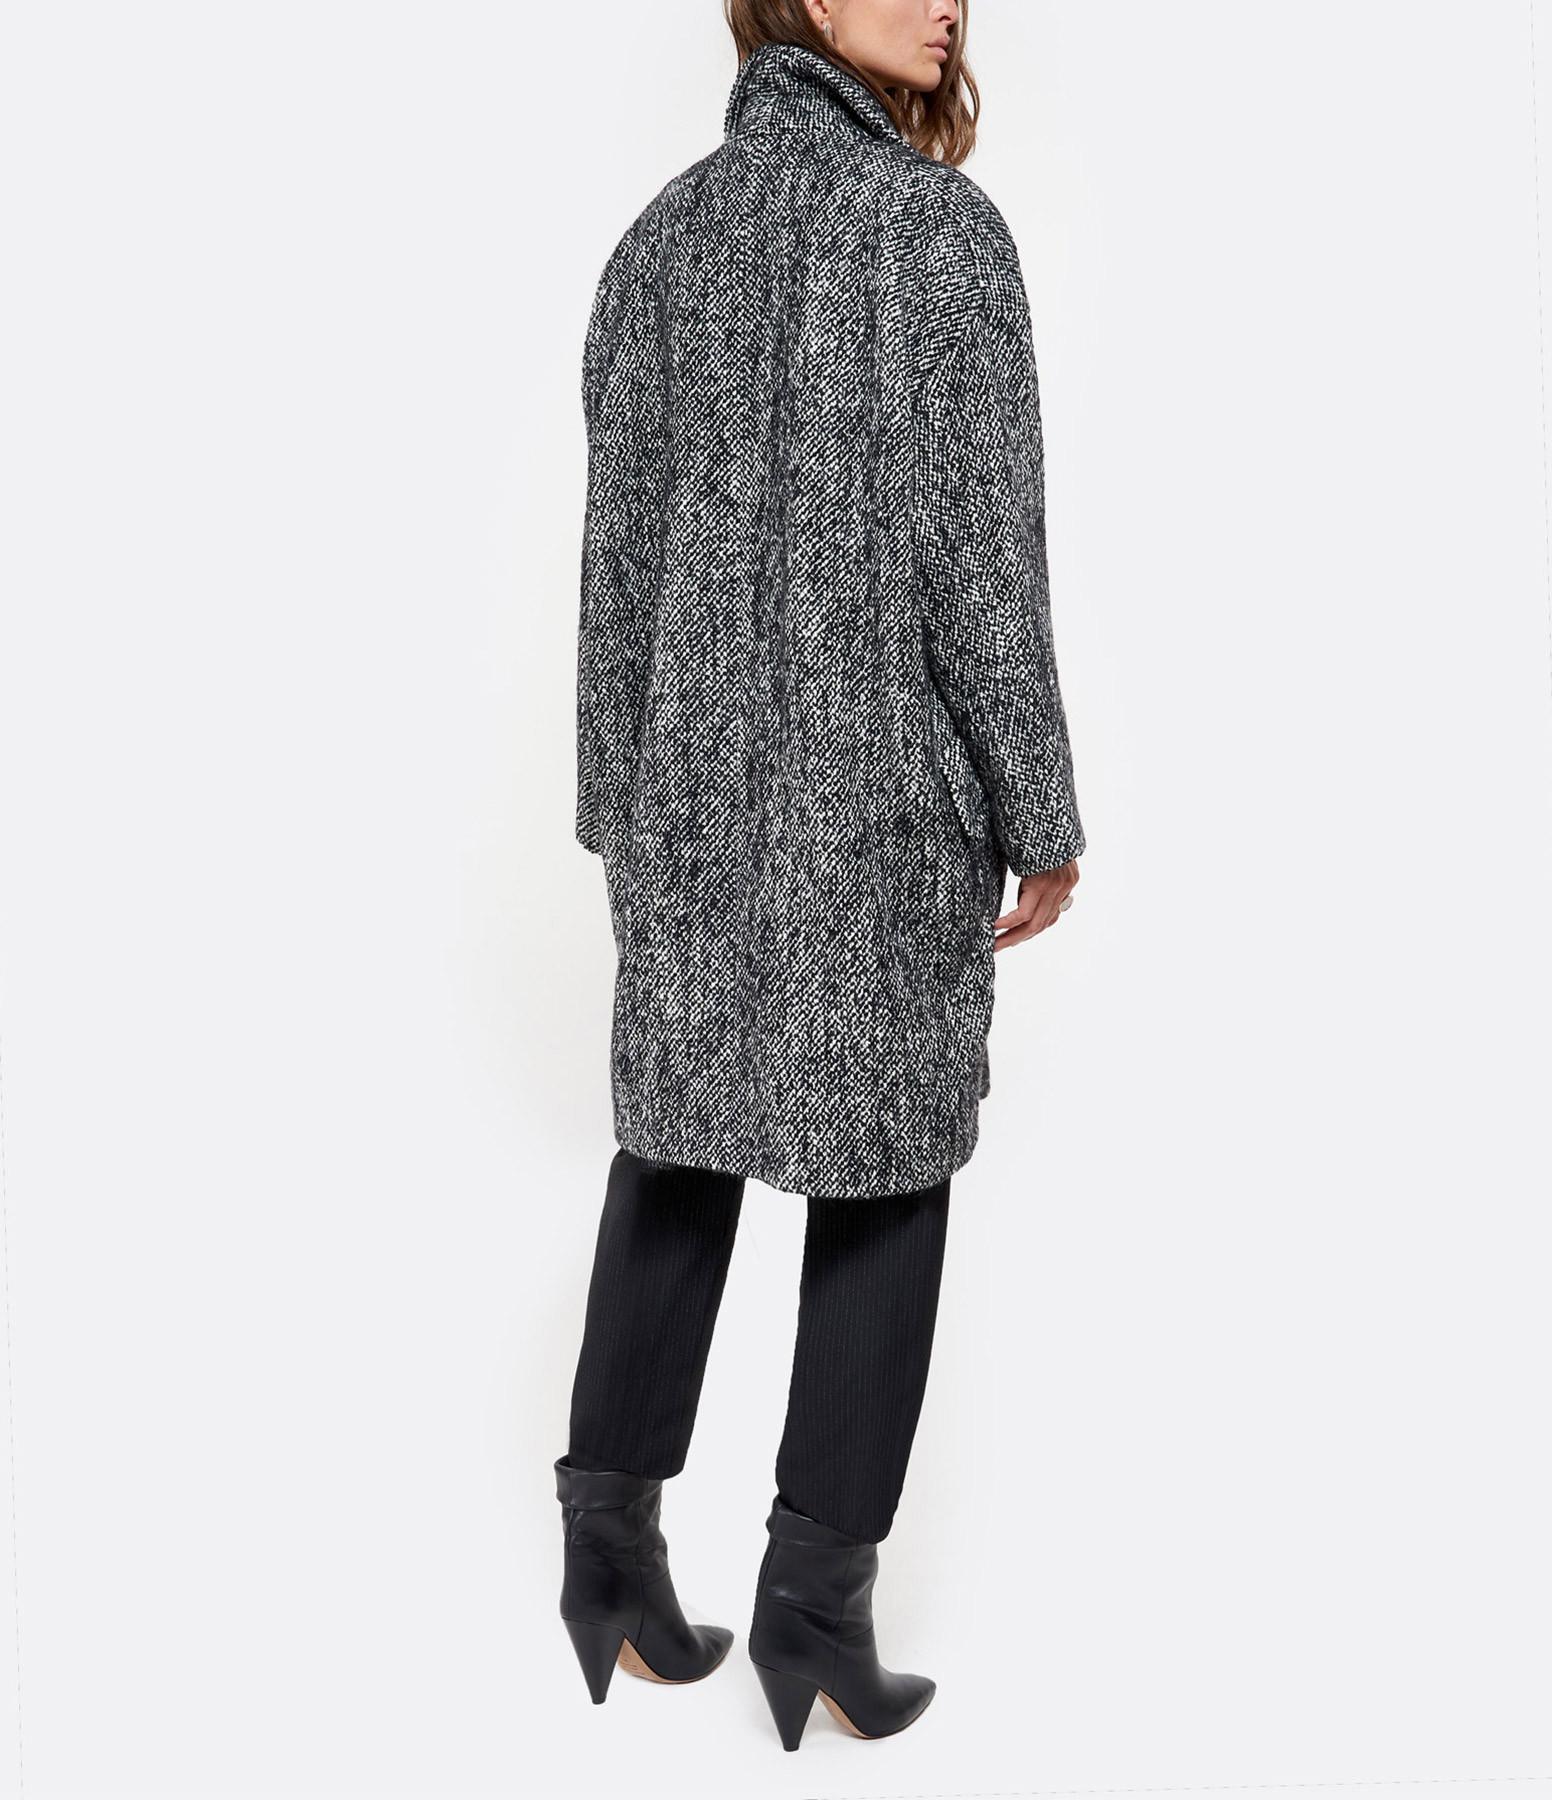 IRO - Manteau Realize Coton Noir Blanc